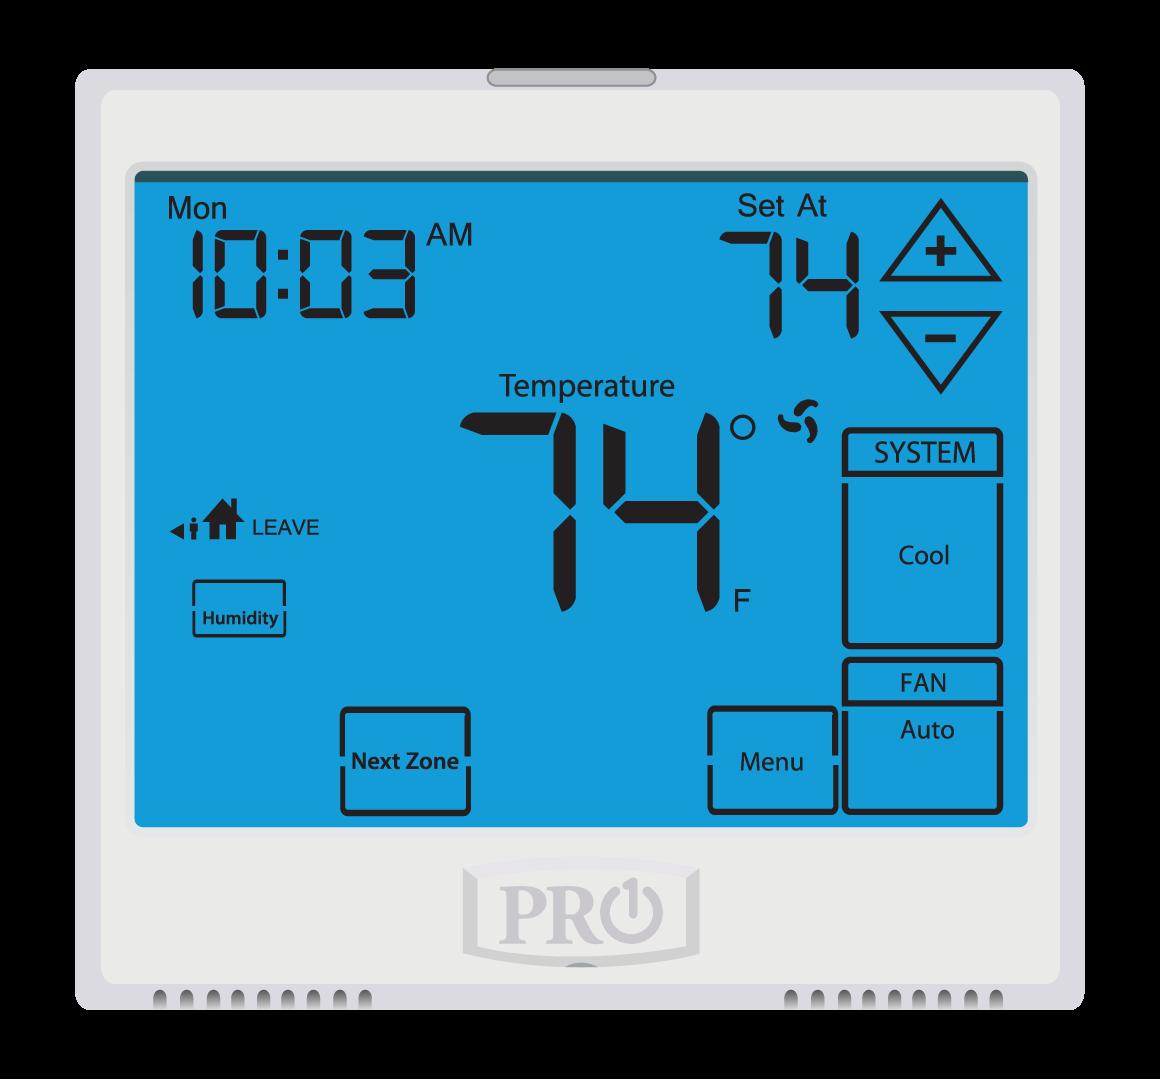 Pro1 Thermostat